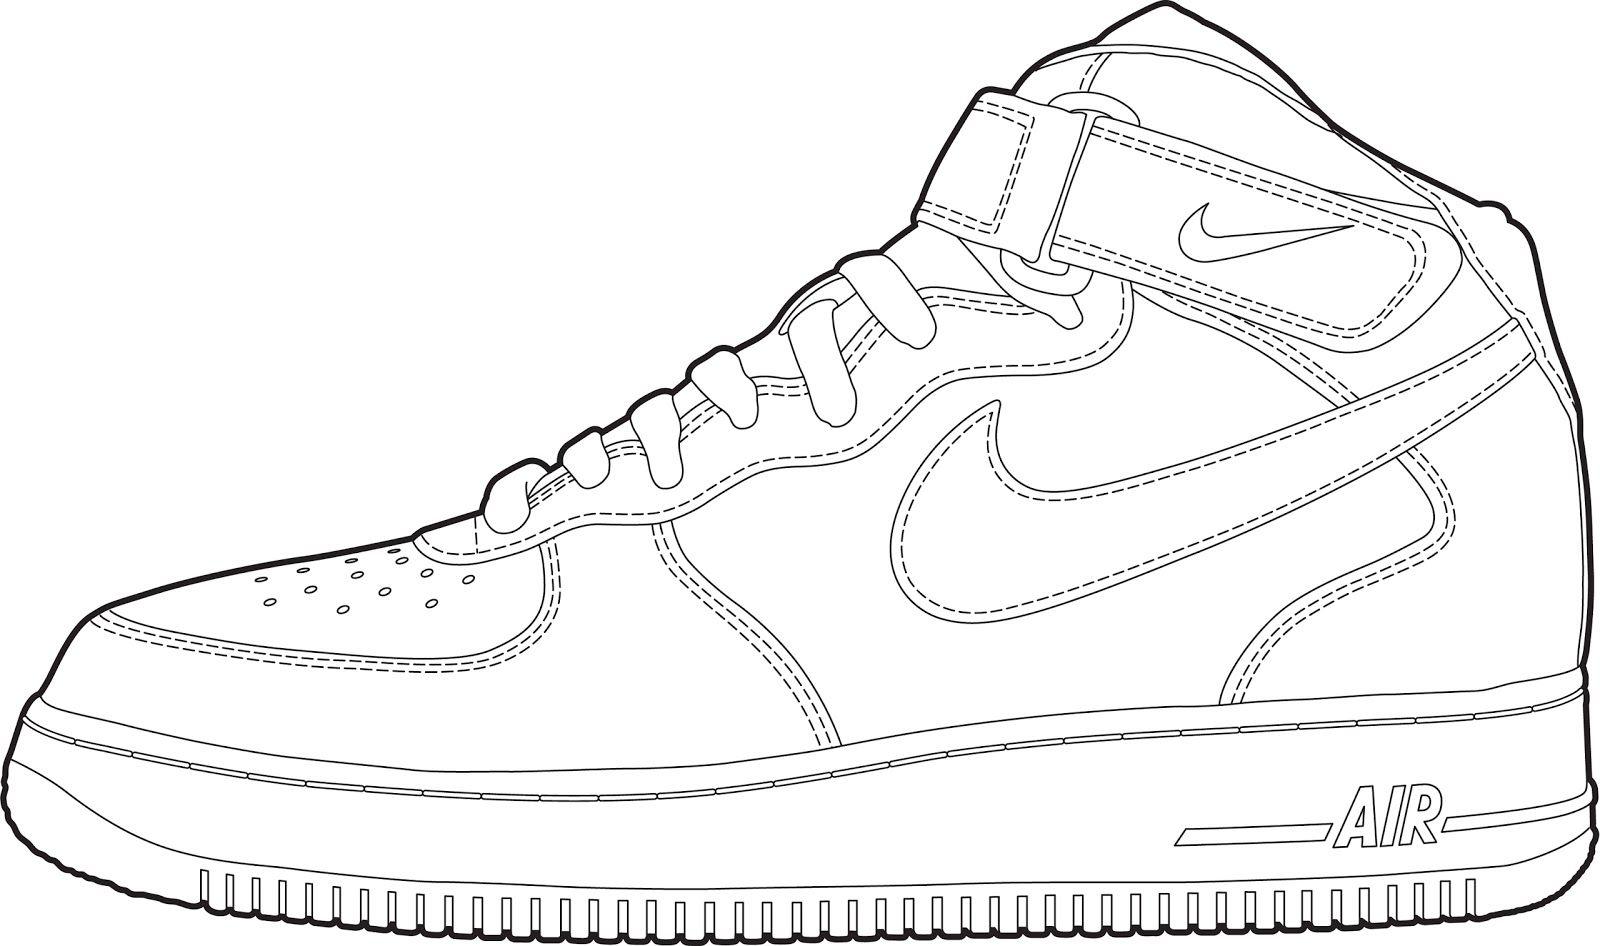 Astronaut Air Force 1 Nike Shoe.